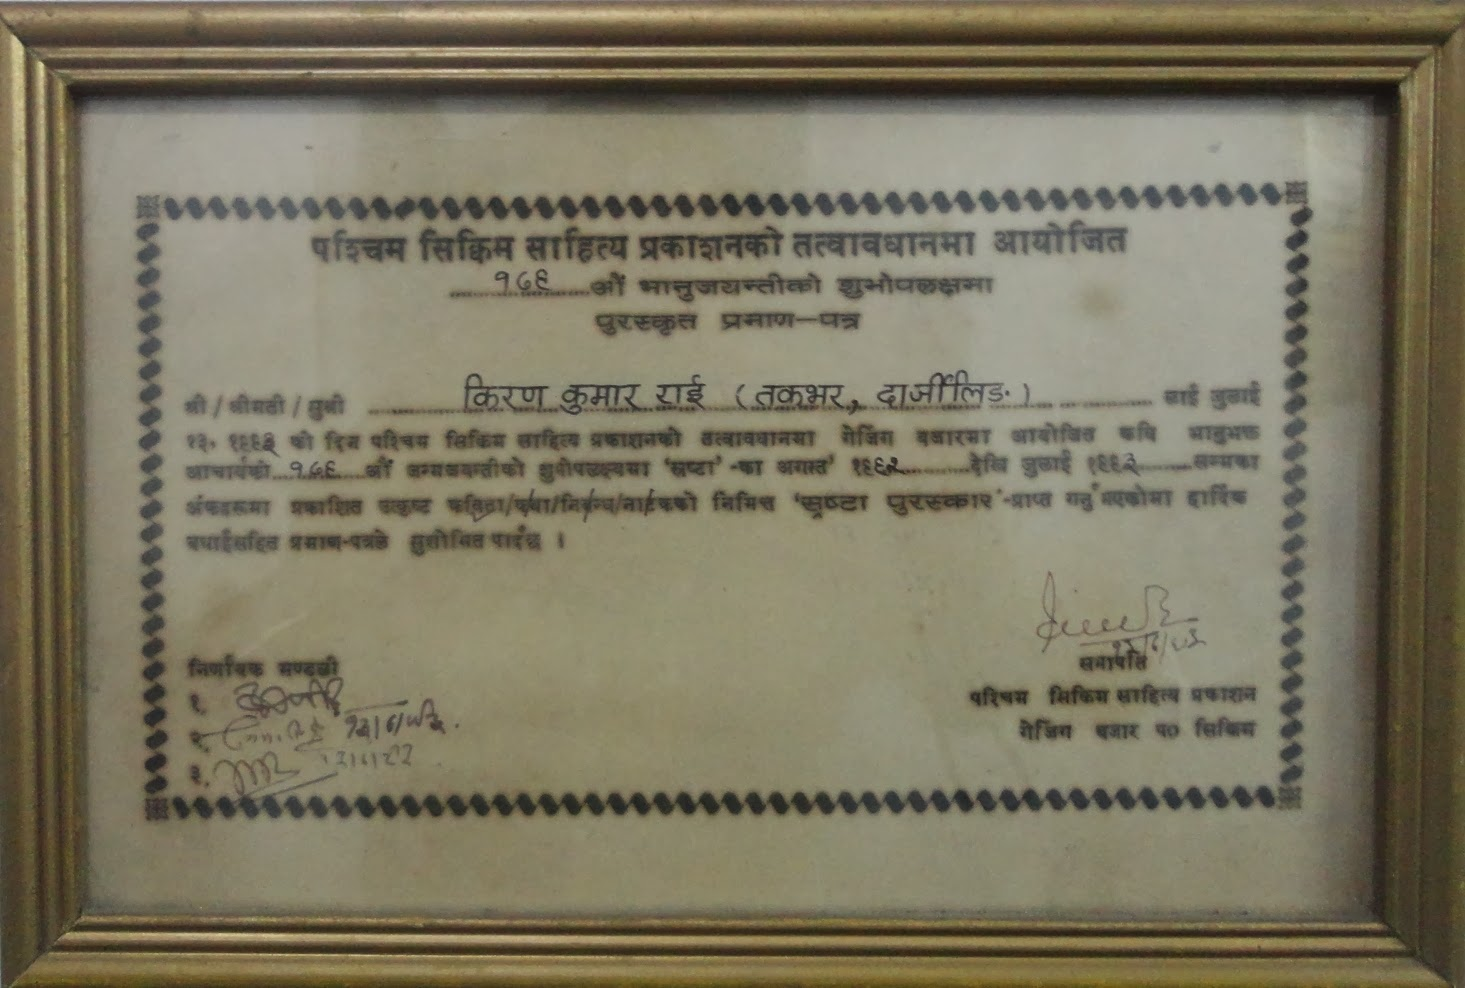 स्रष्टा पुरस्कार-१९९३